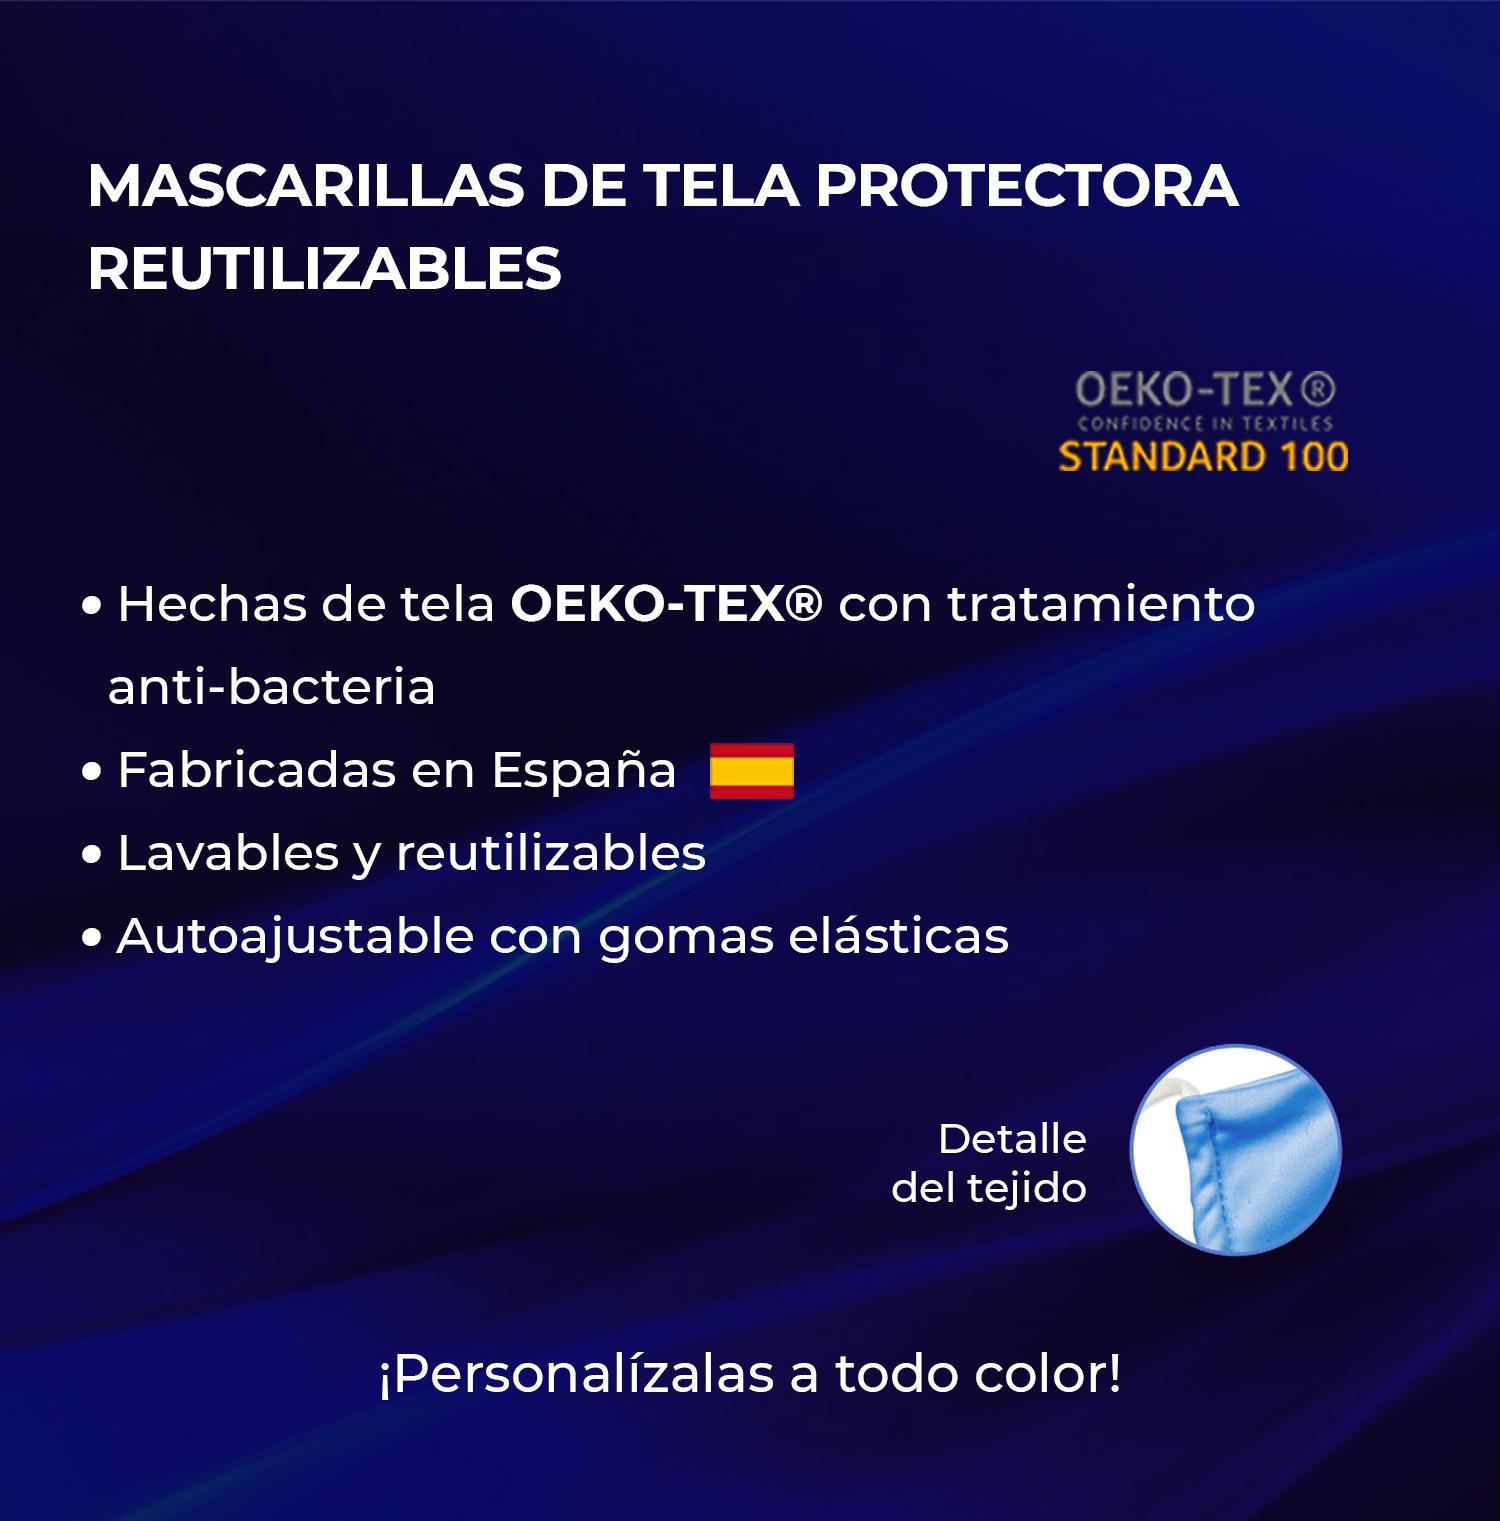 Mascarilla de tela protectora reutilizable para niño